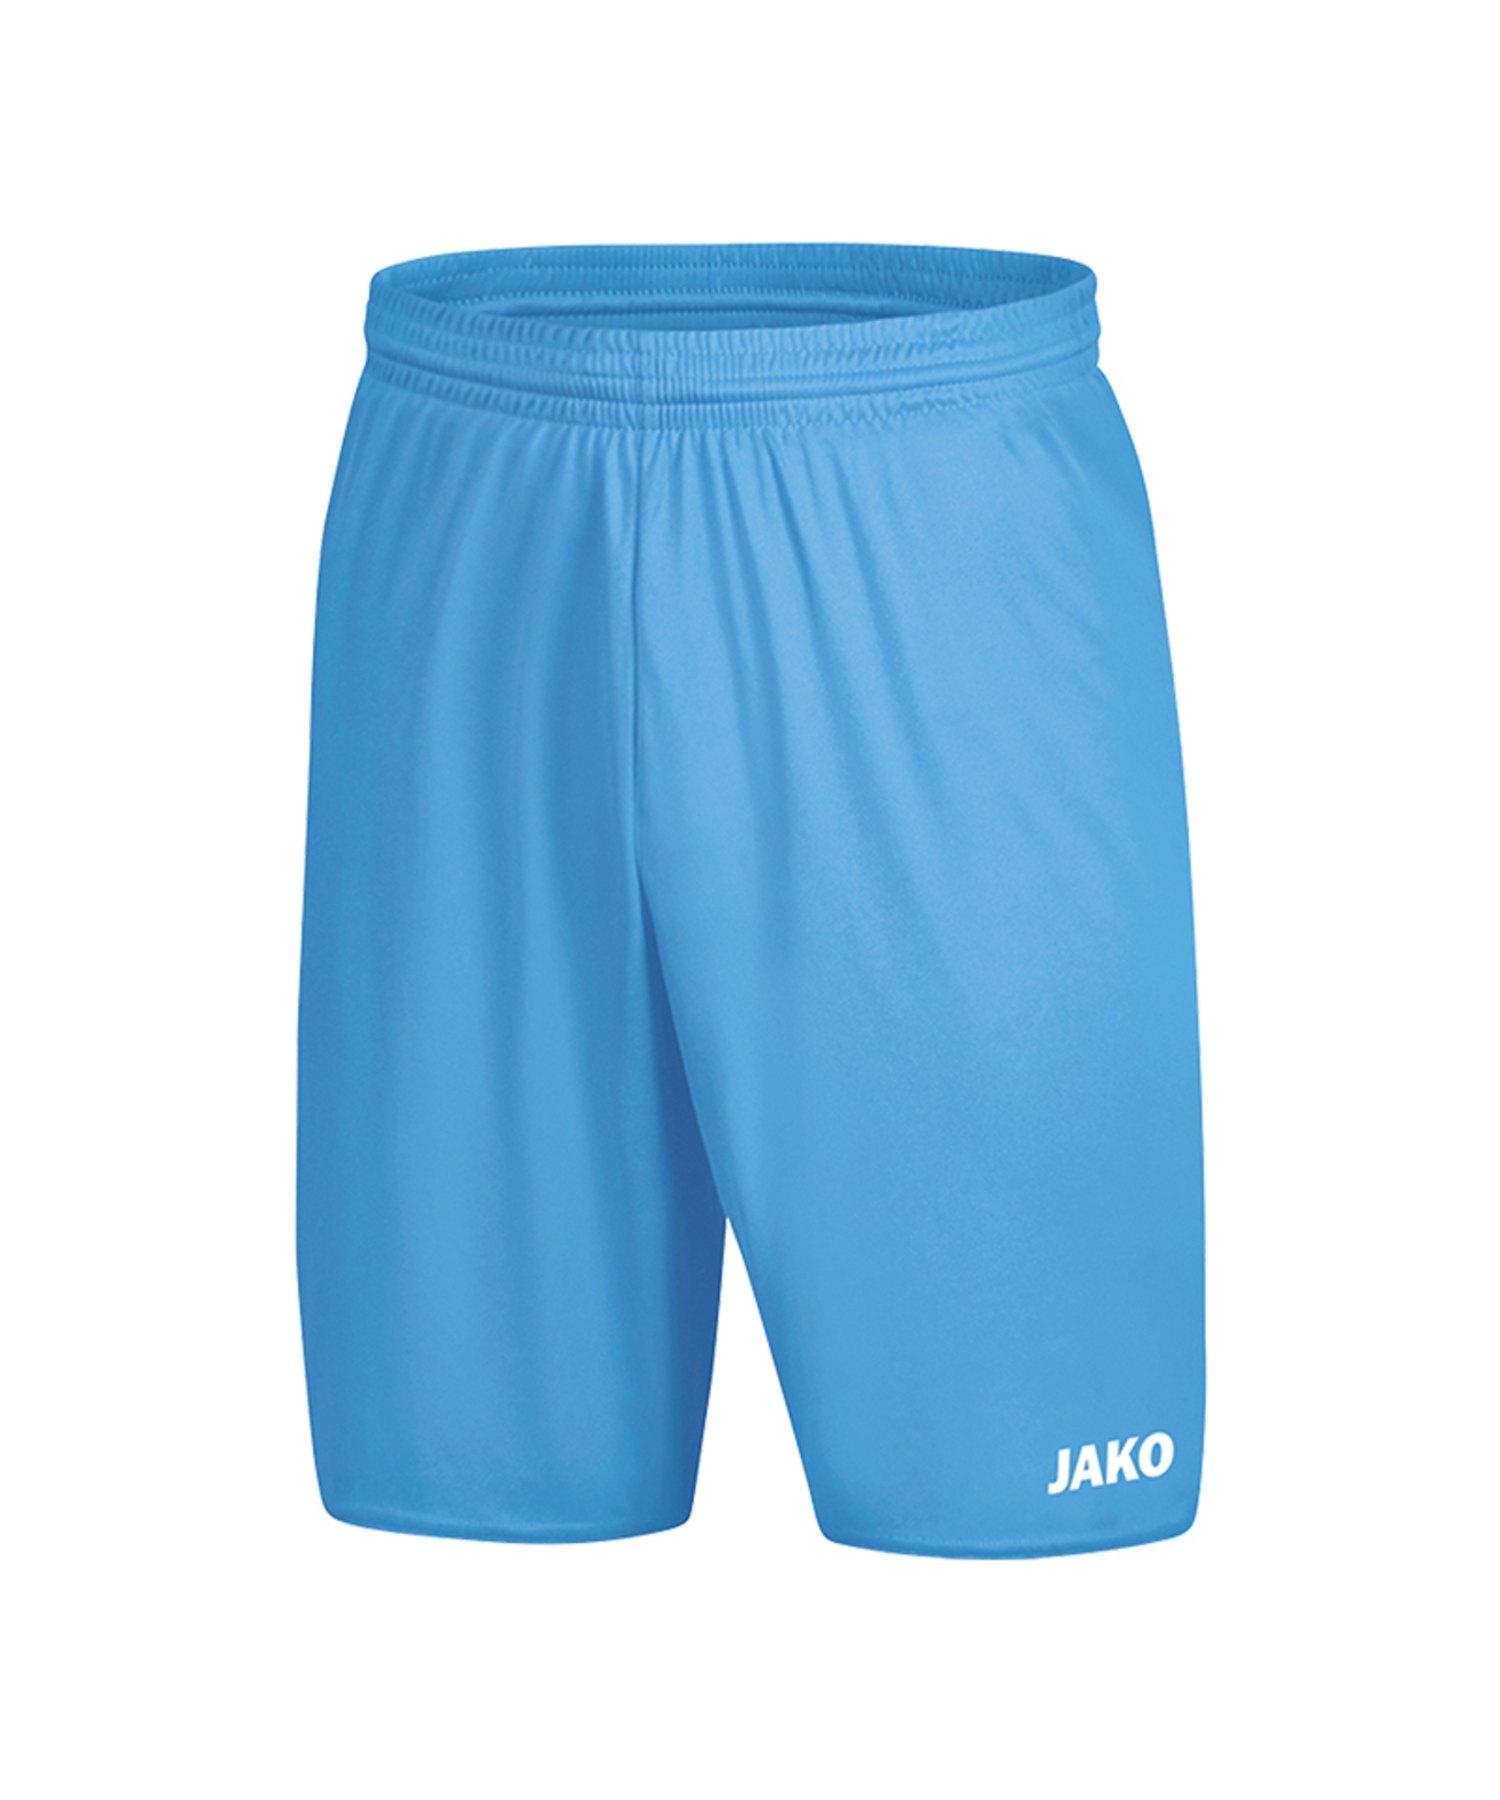 Jako Manchester 2.0 Short ohne Innenslip Blau F45 - Blau